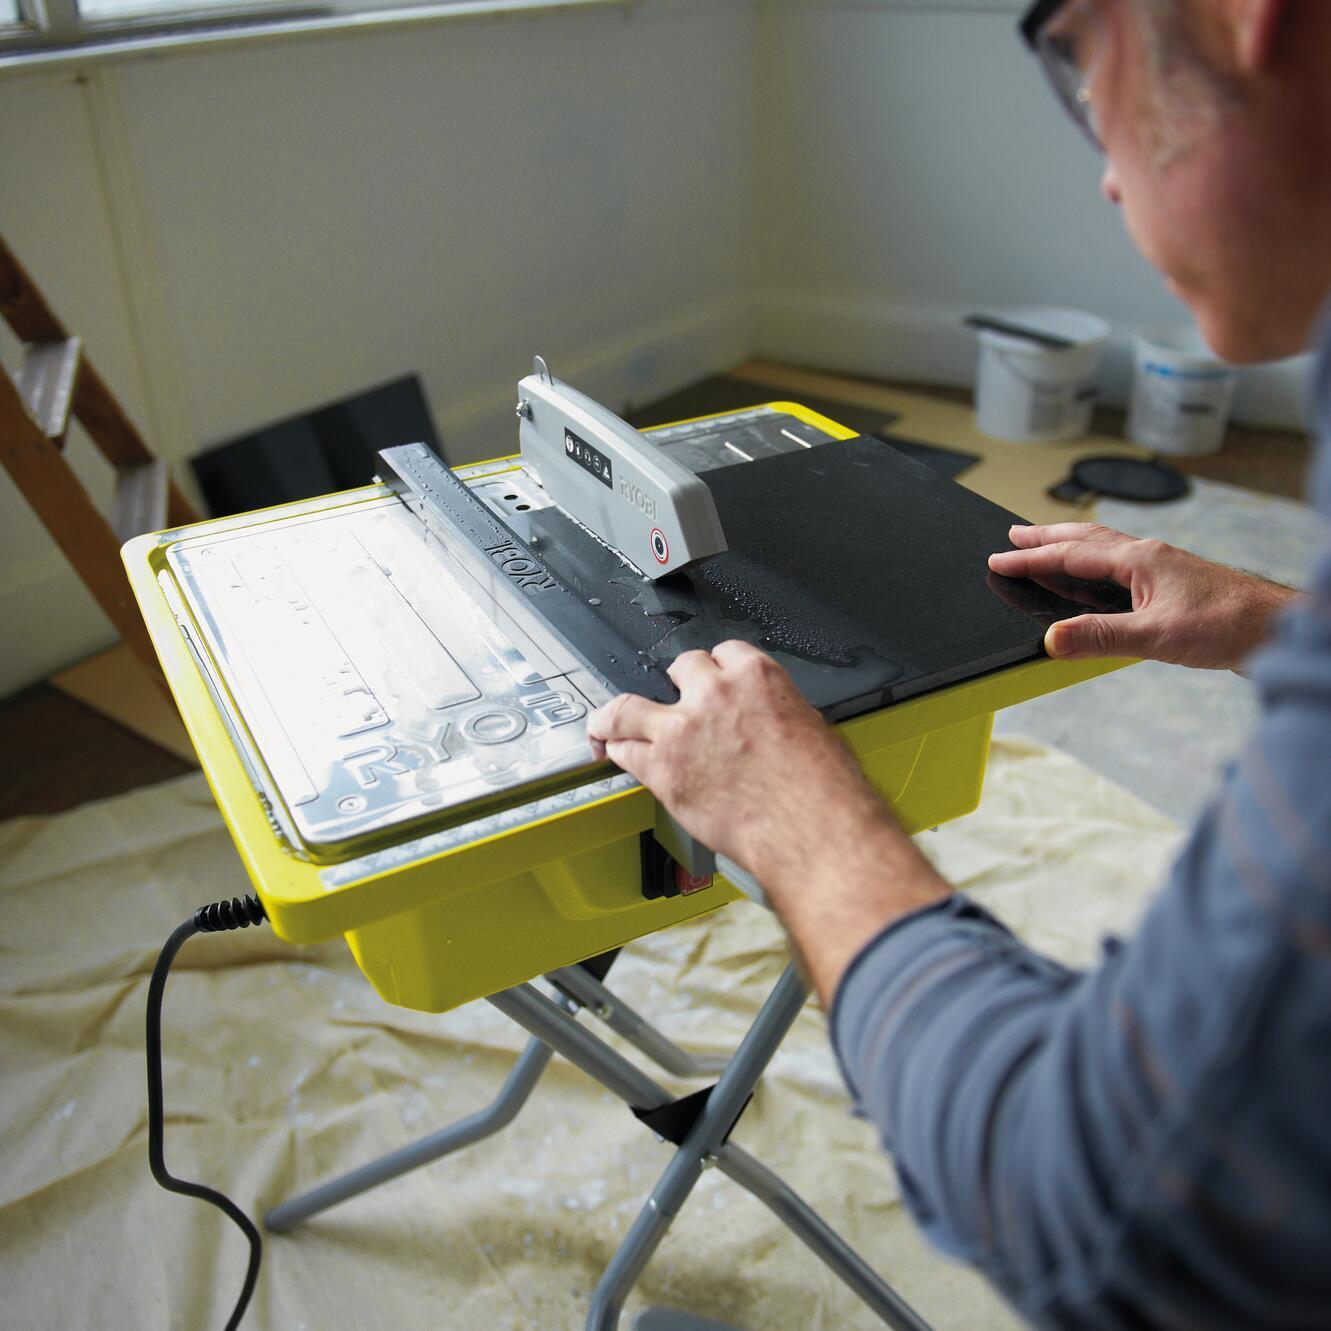 Tagliapiastrelle elettrica RYOBI Ø disco 178 mm, H taglio 33 mm, 500 W - 3